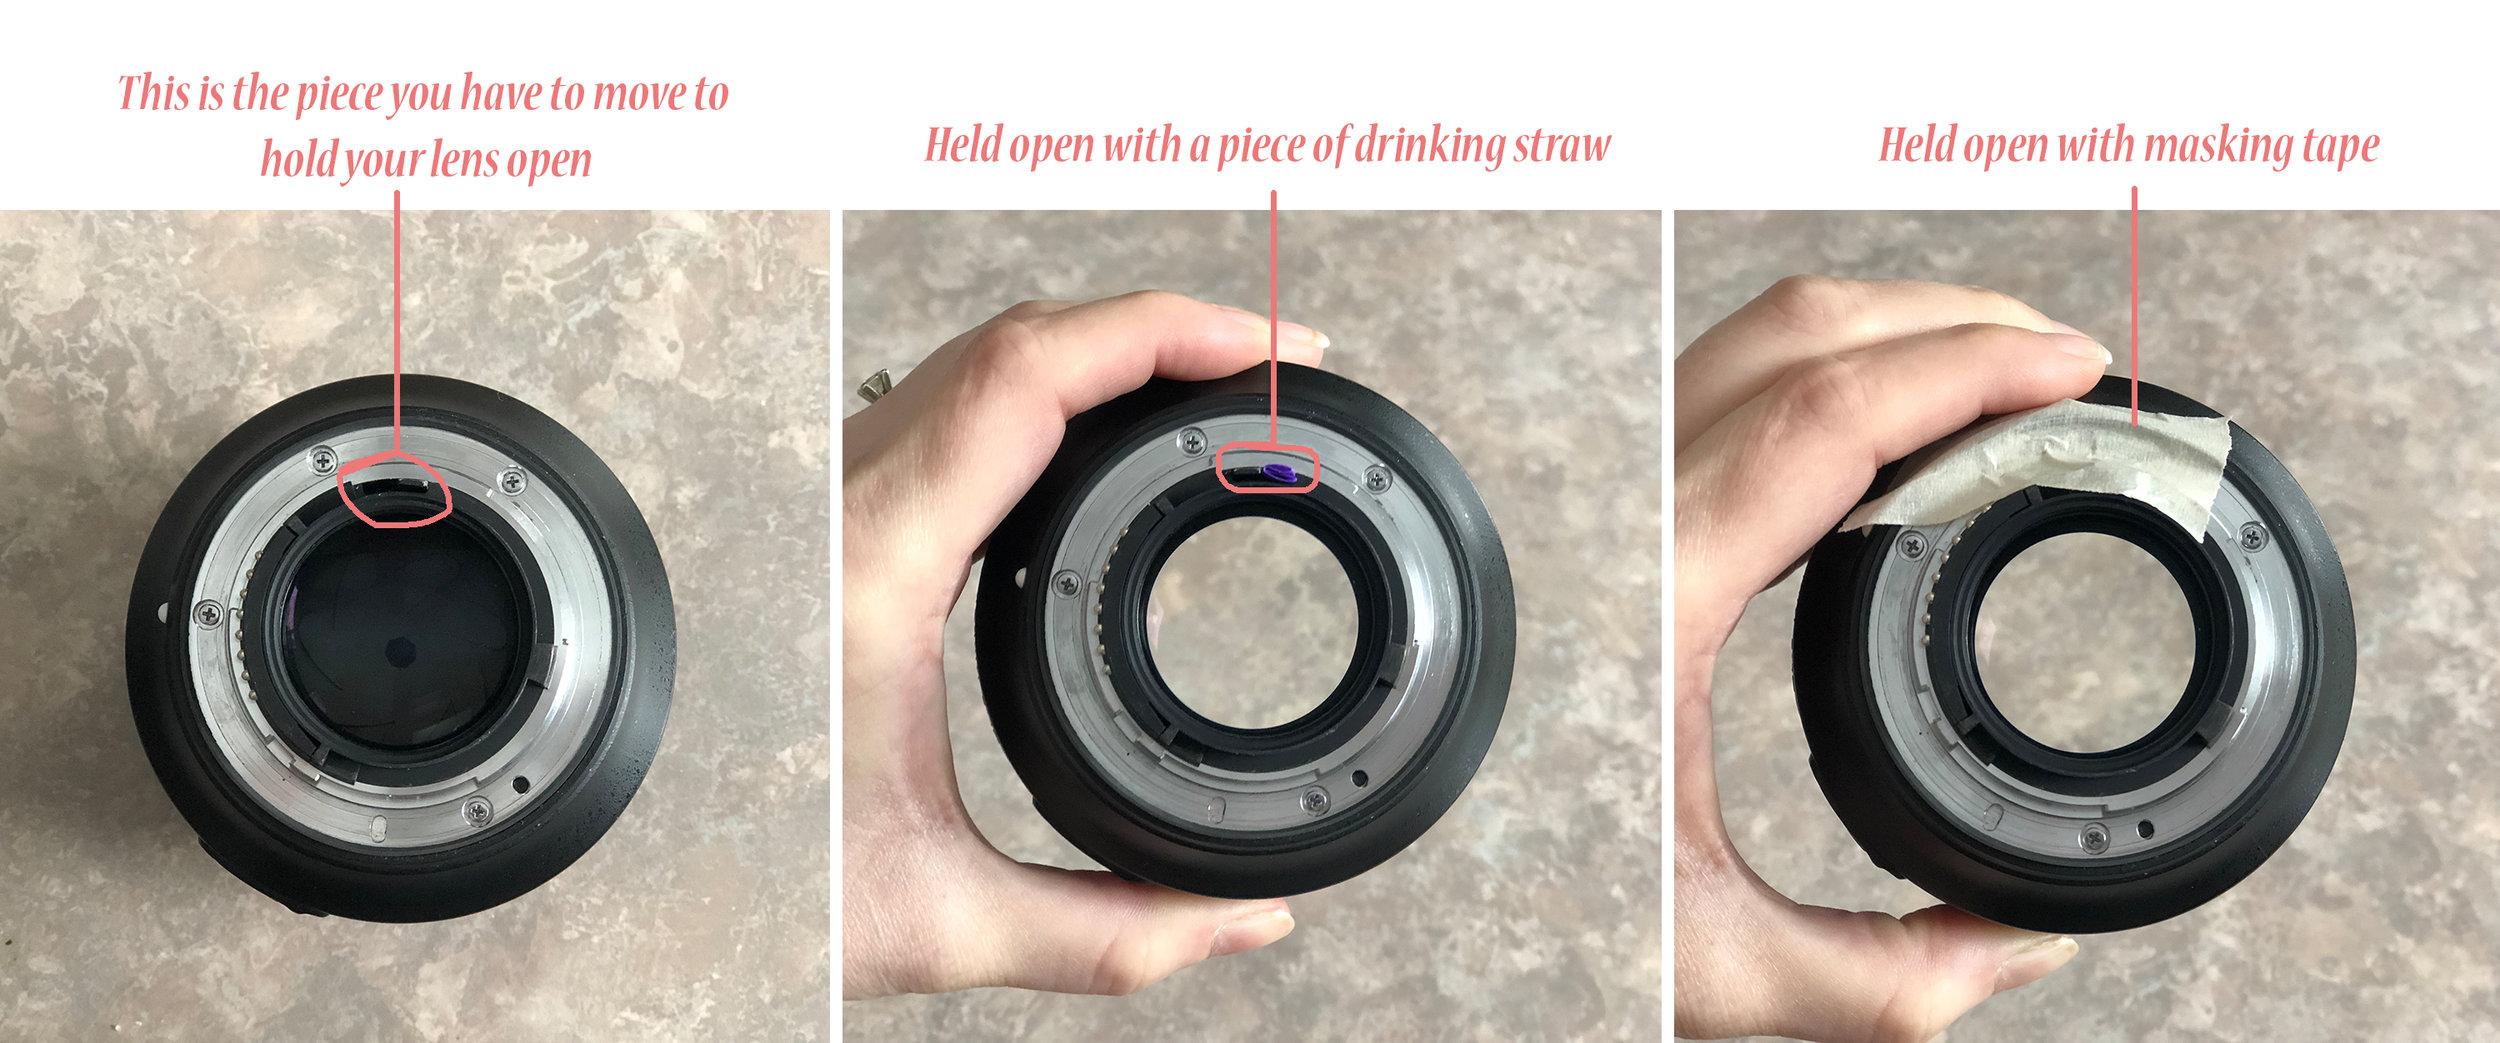 Rigged Lens.jpg